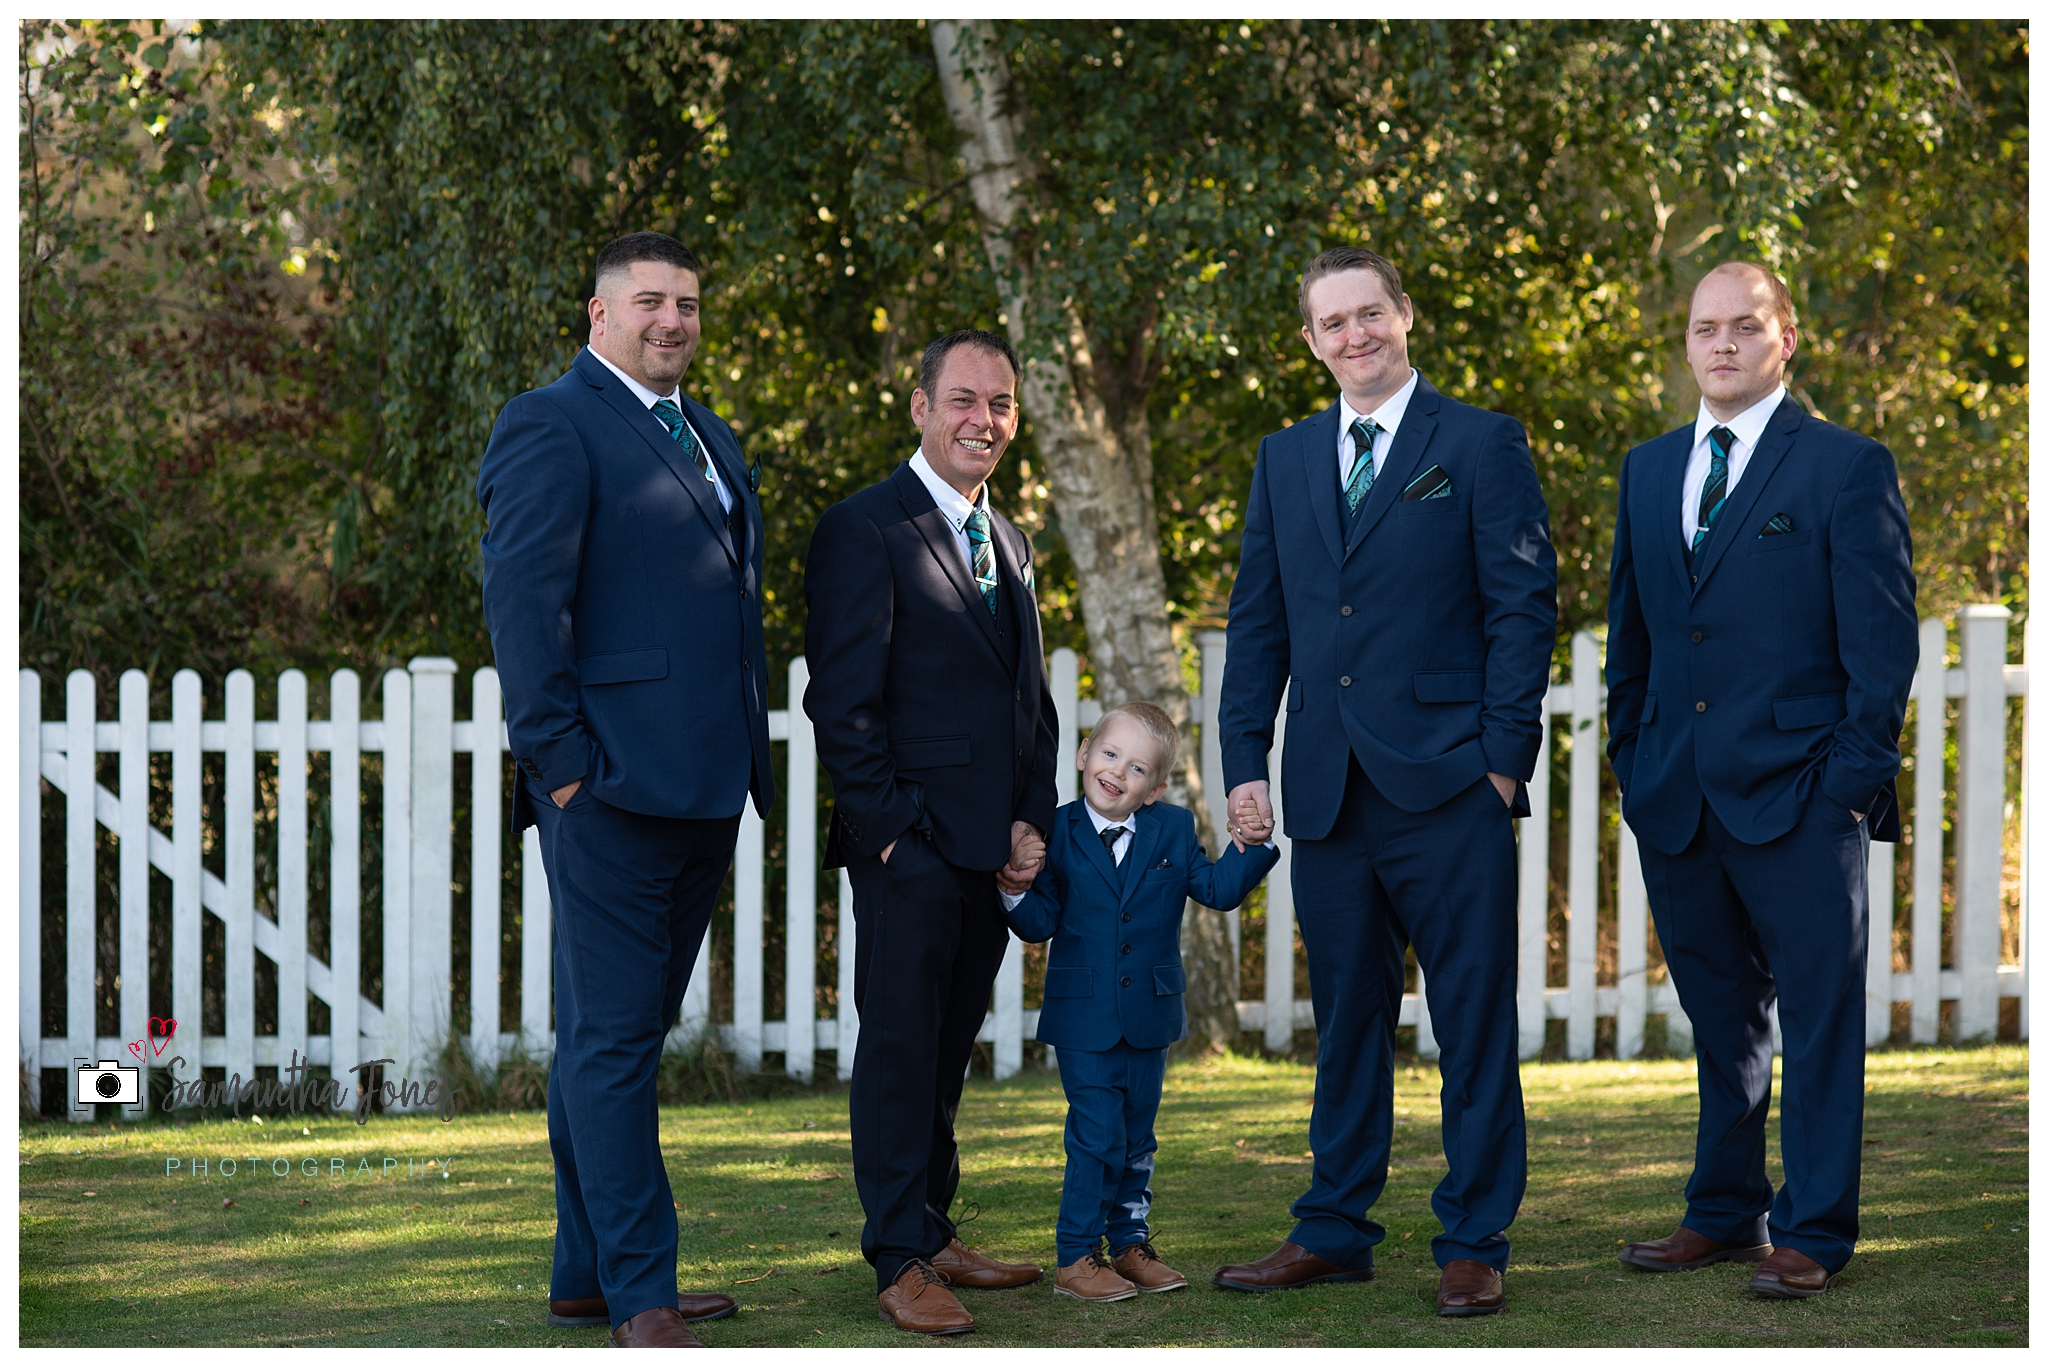 bride and groom twilight wedding groom party